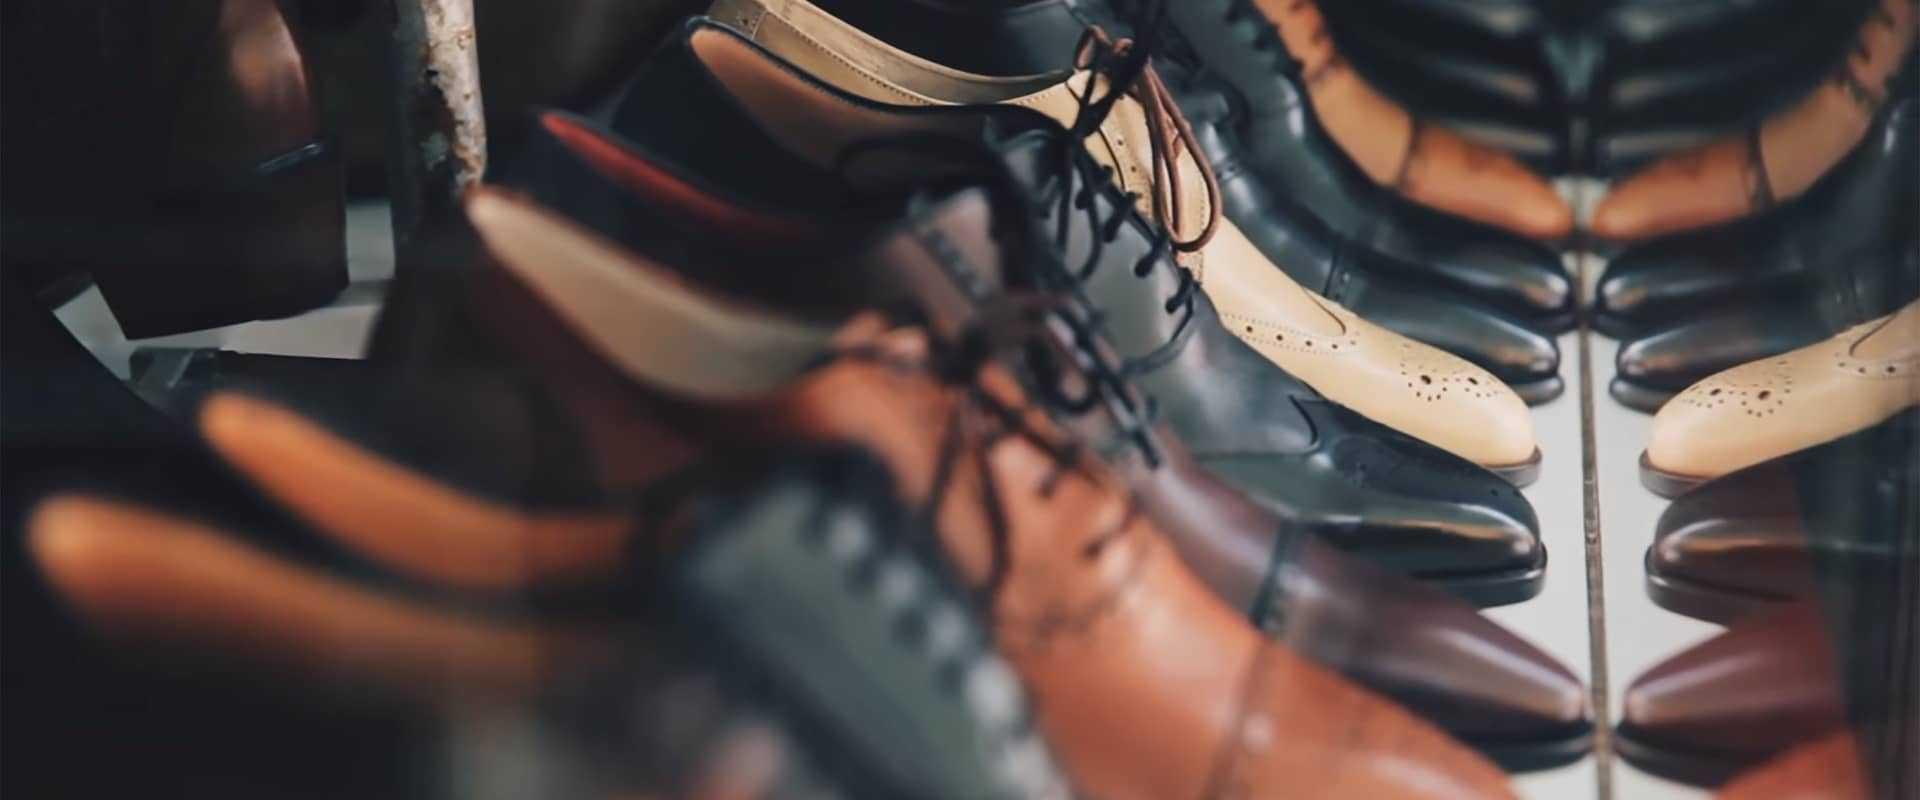 COSYS Smartphone Inventur für Leder-Schuh